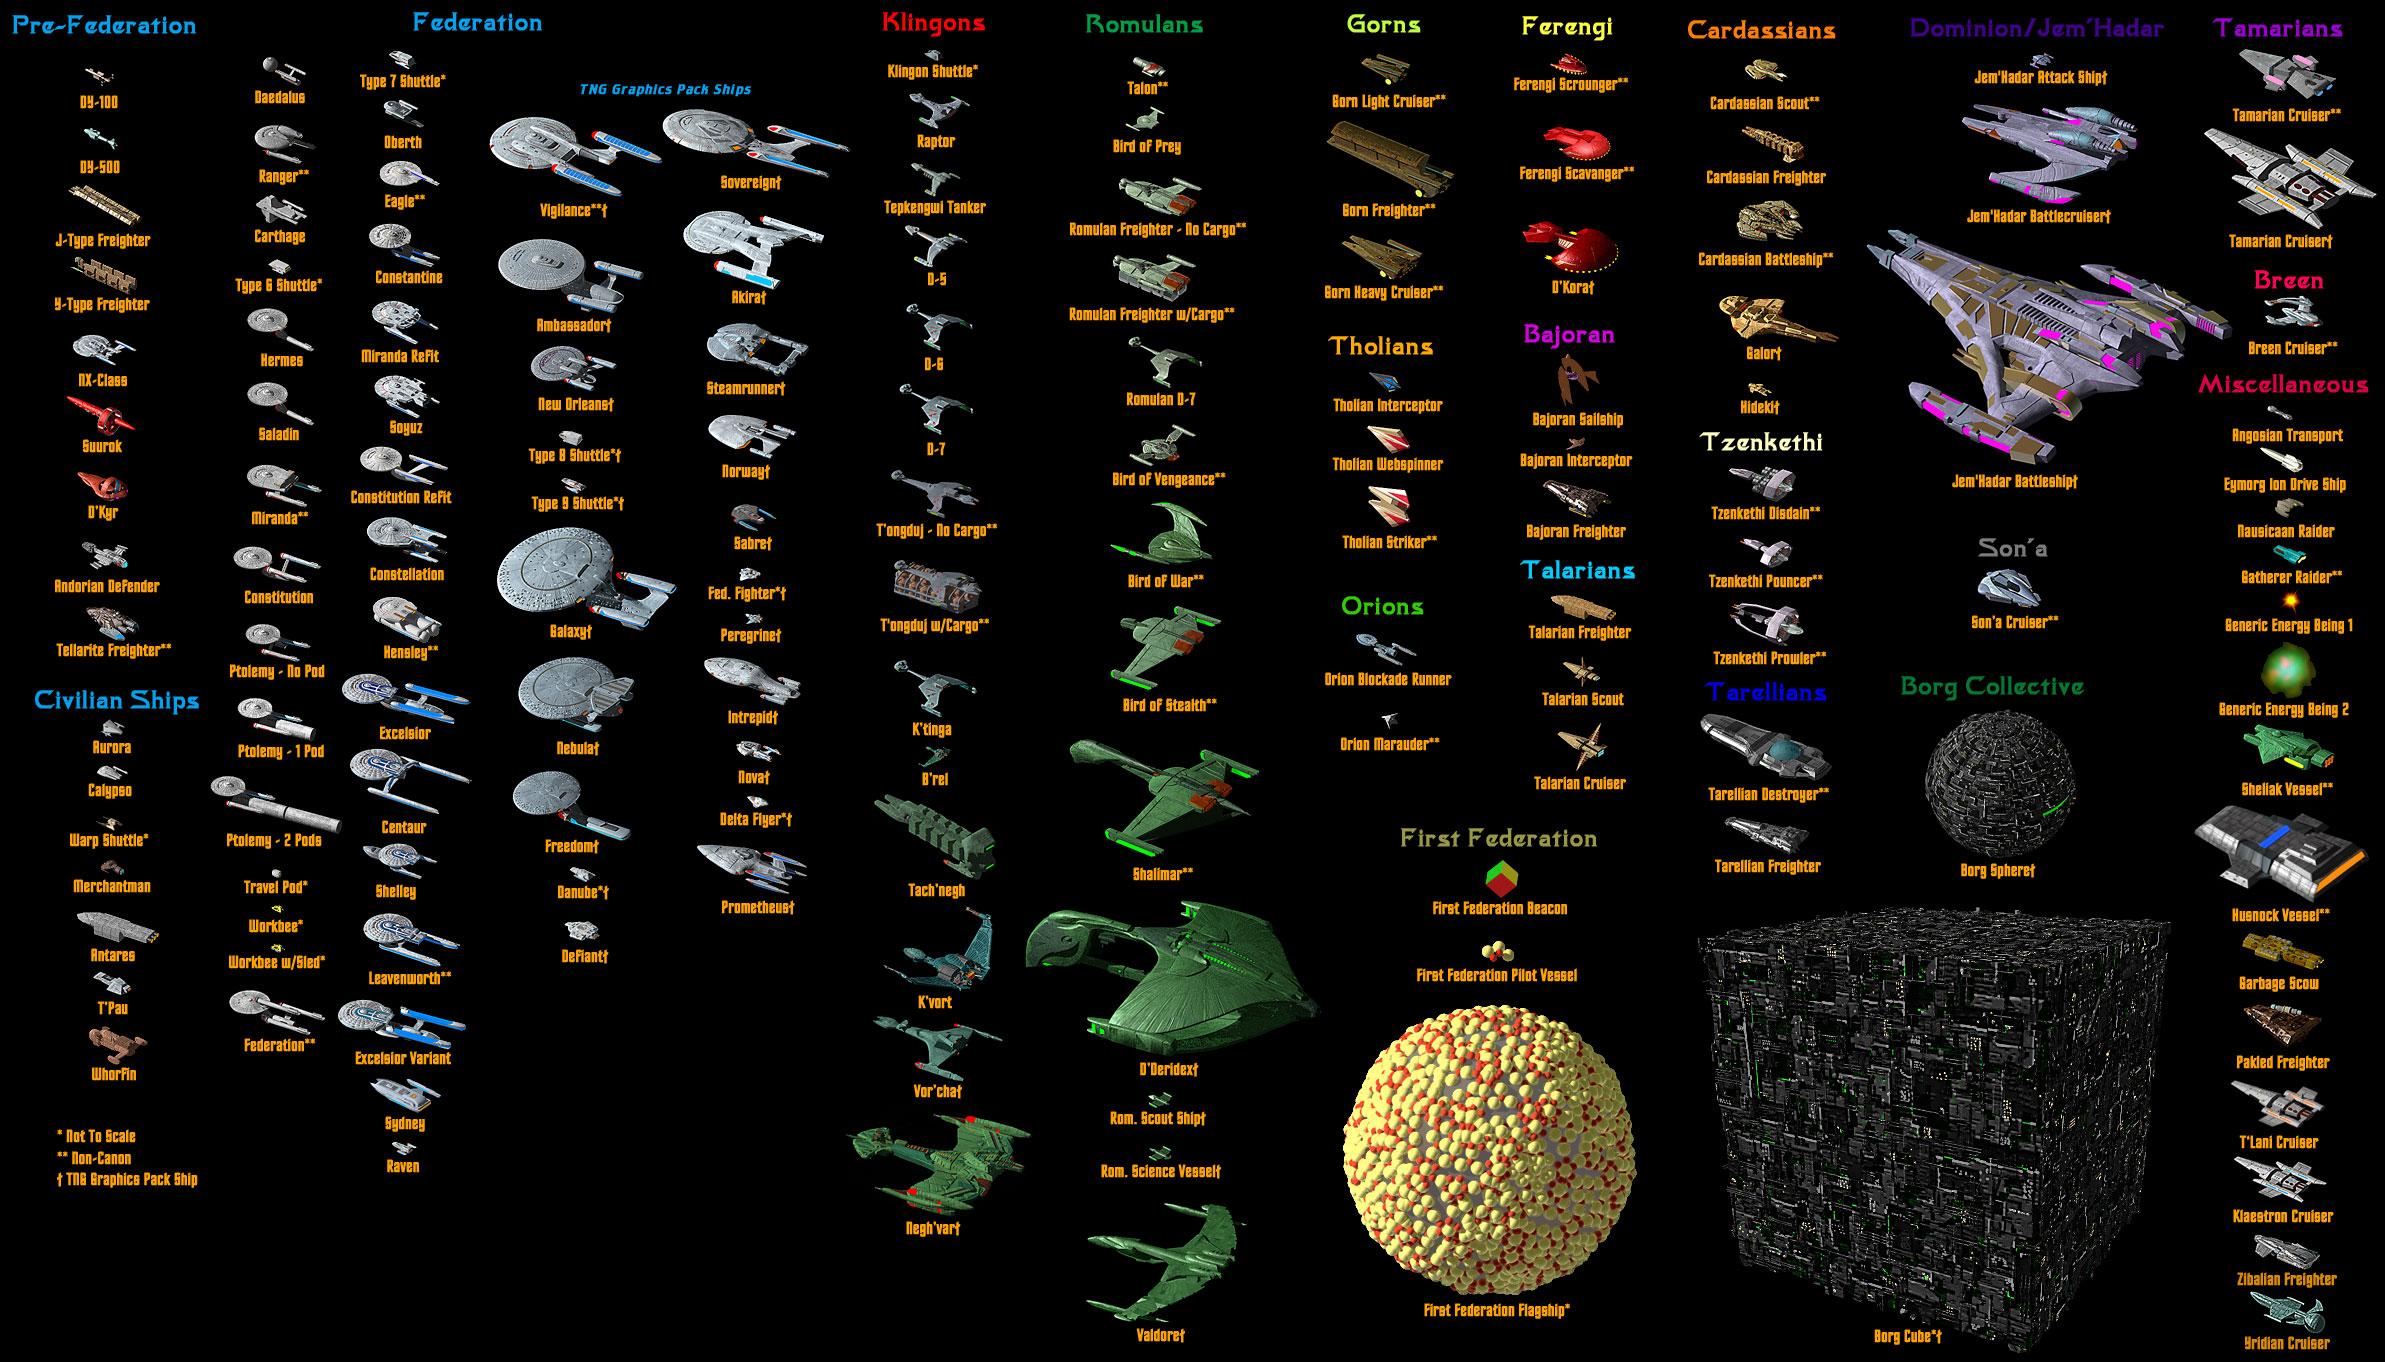 Wallpaper Abyss Explore the Collection Star Trek Sci Fi Star Trek 2385x1362